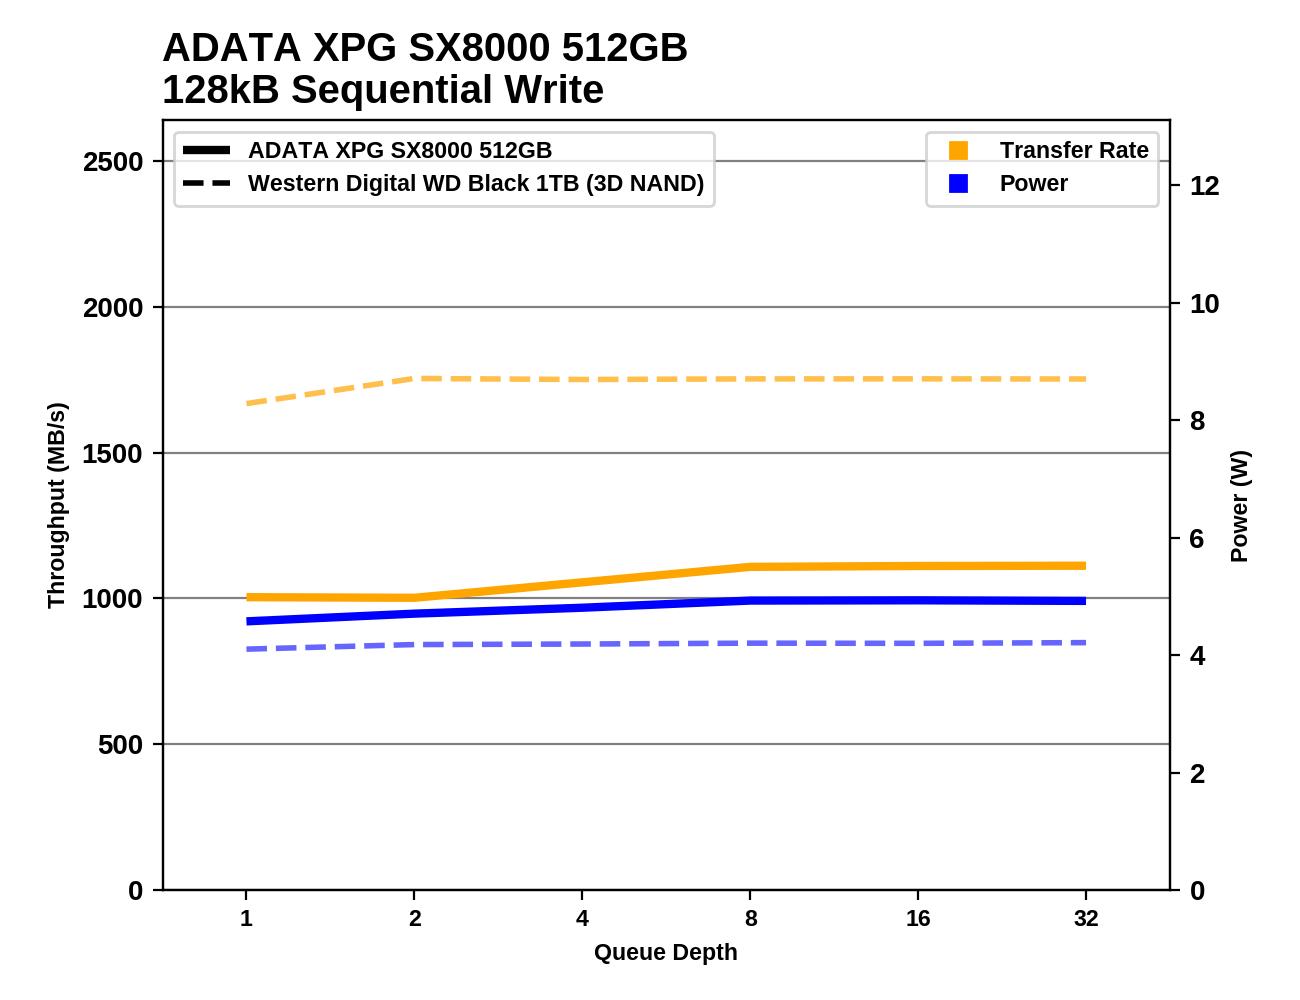 Обзор Western Digital WD Black 3D NAND SSD: EVO встретил равного - 102